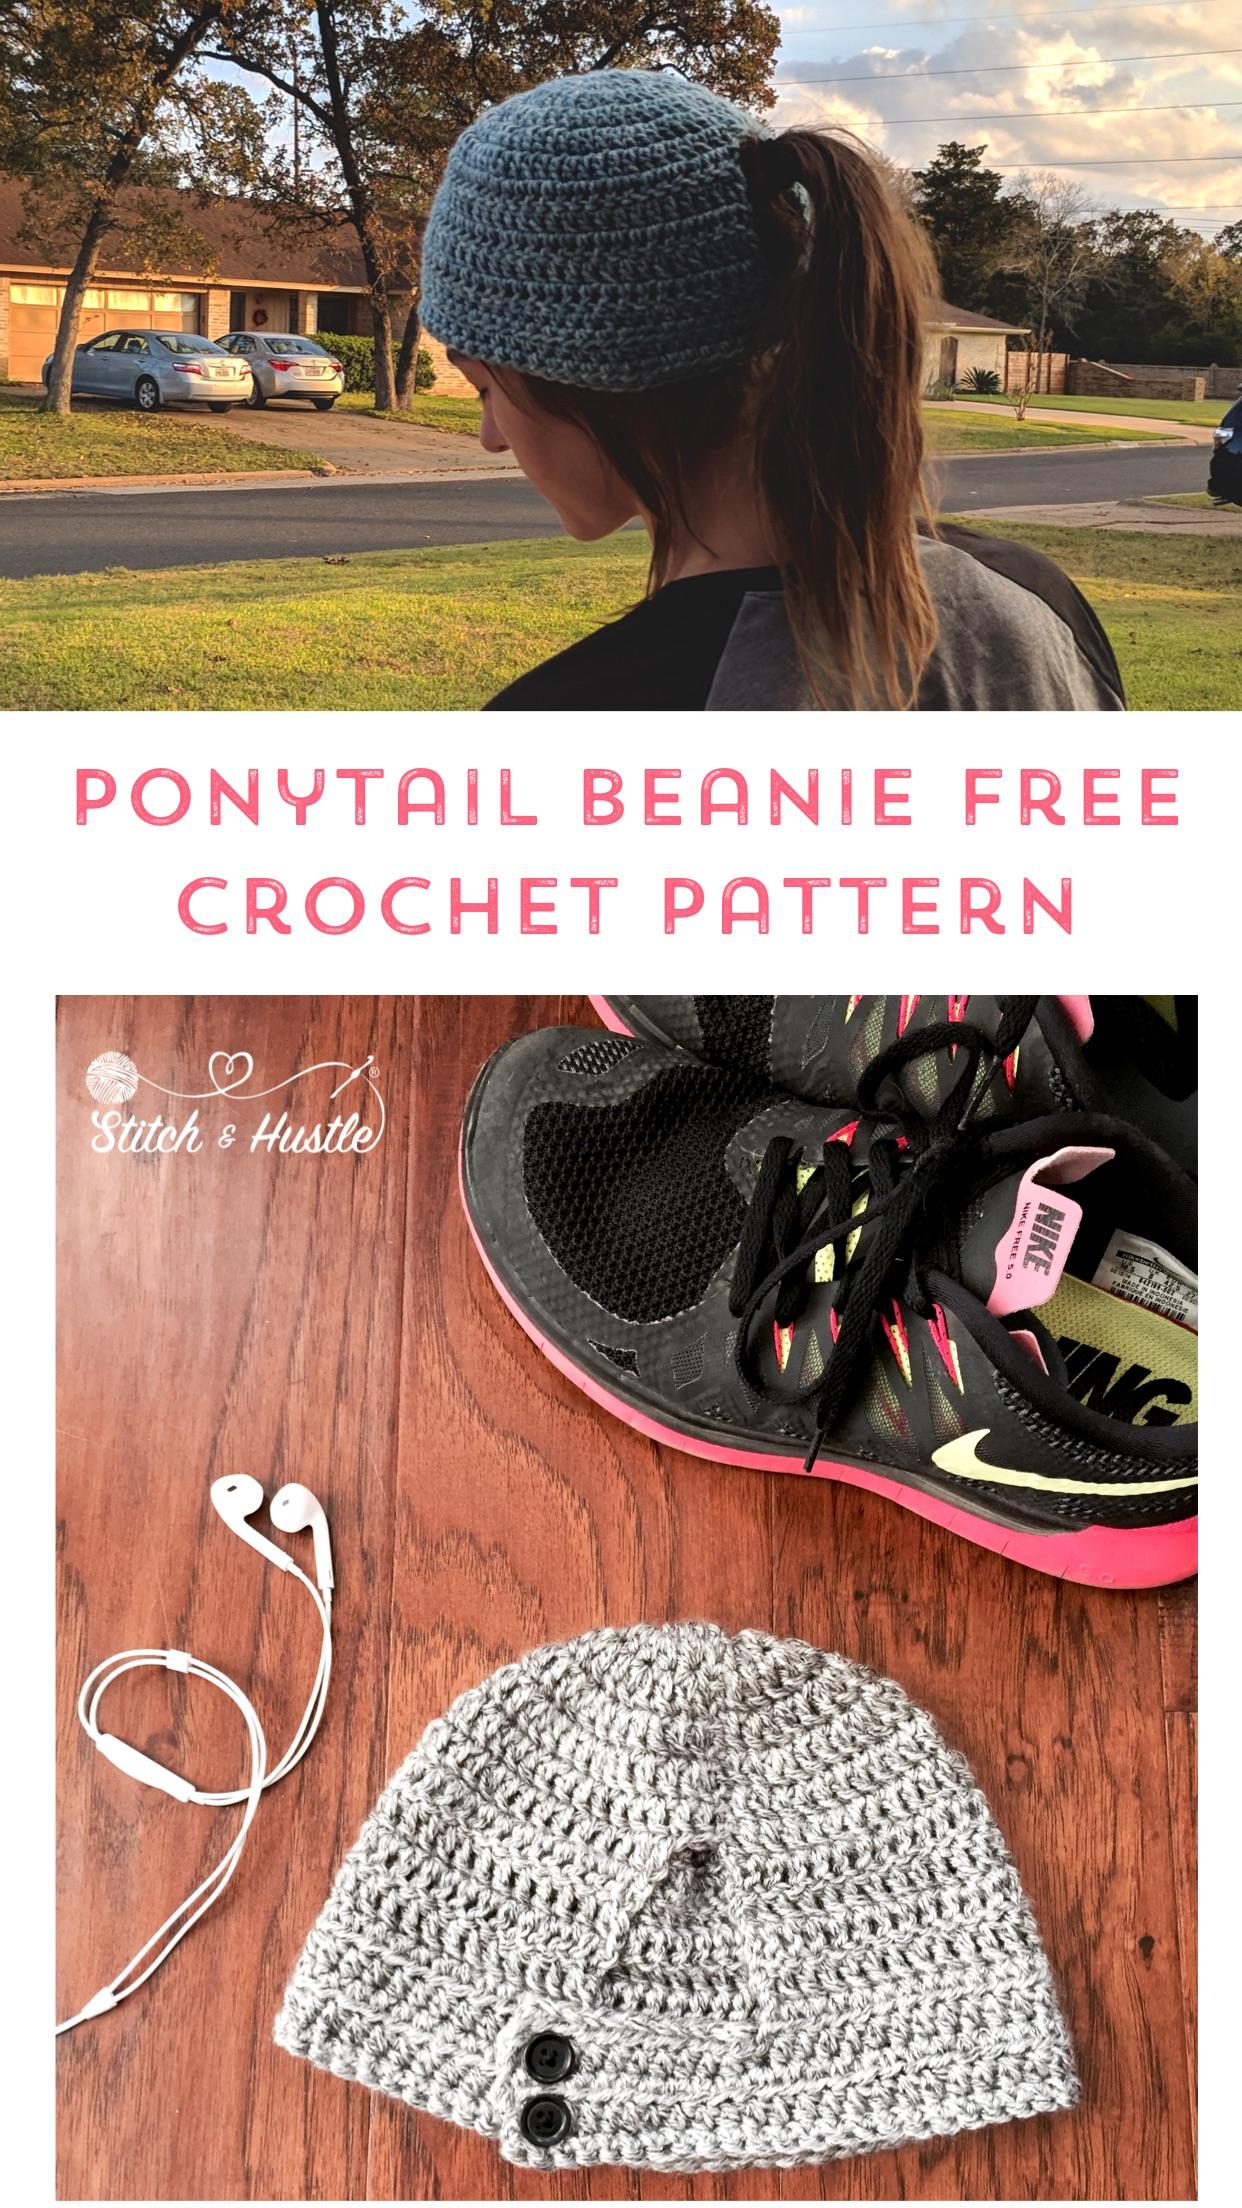 ponytail_beanie_free_crochet_pattern_3.jpg